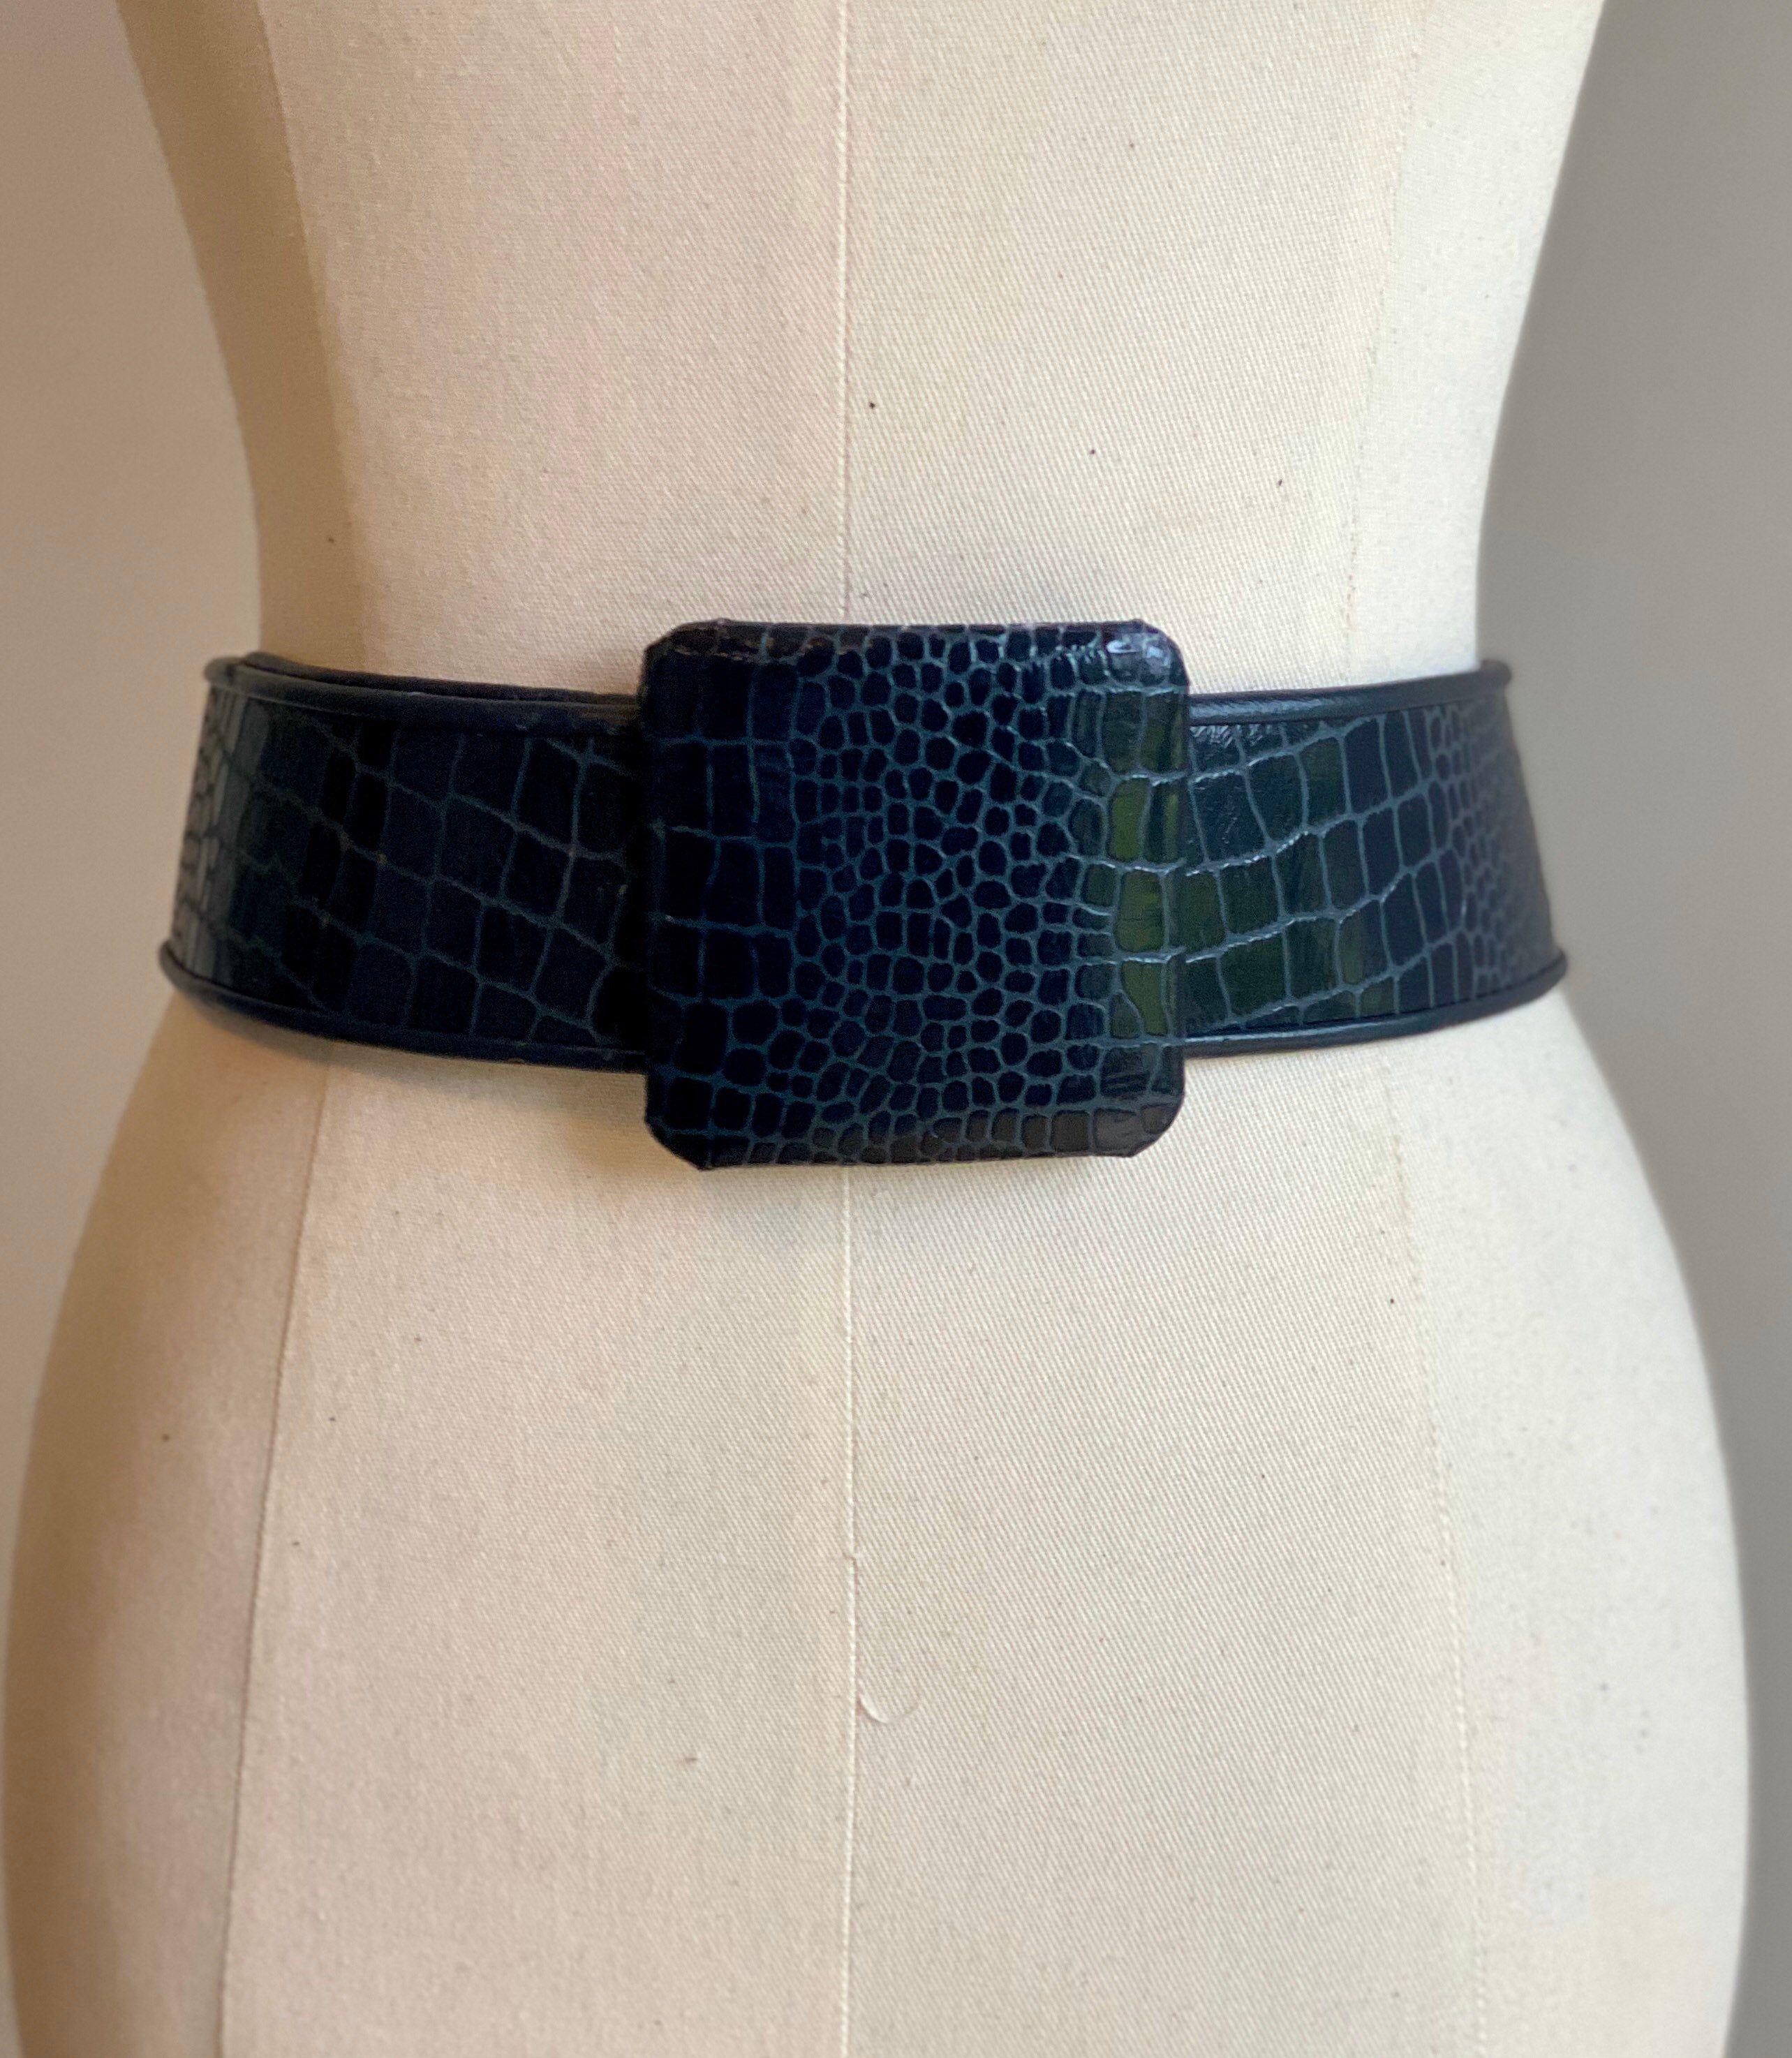 Excited to share the latest addition to my #etsy shop: GALANOS Wide Blue Croc Belt #vintageglam #vintage #80sparty #widebelt #navybelt #leather #crocbelt #goodthingsvintage #galanos